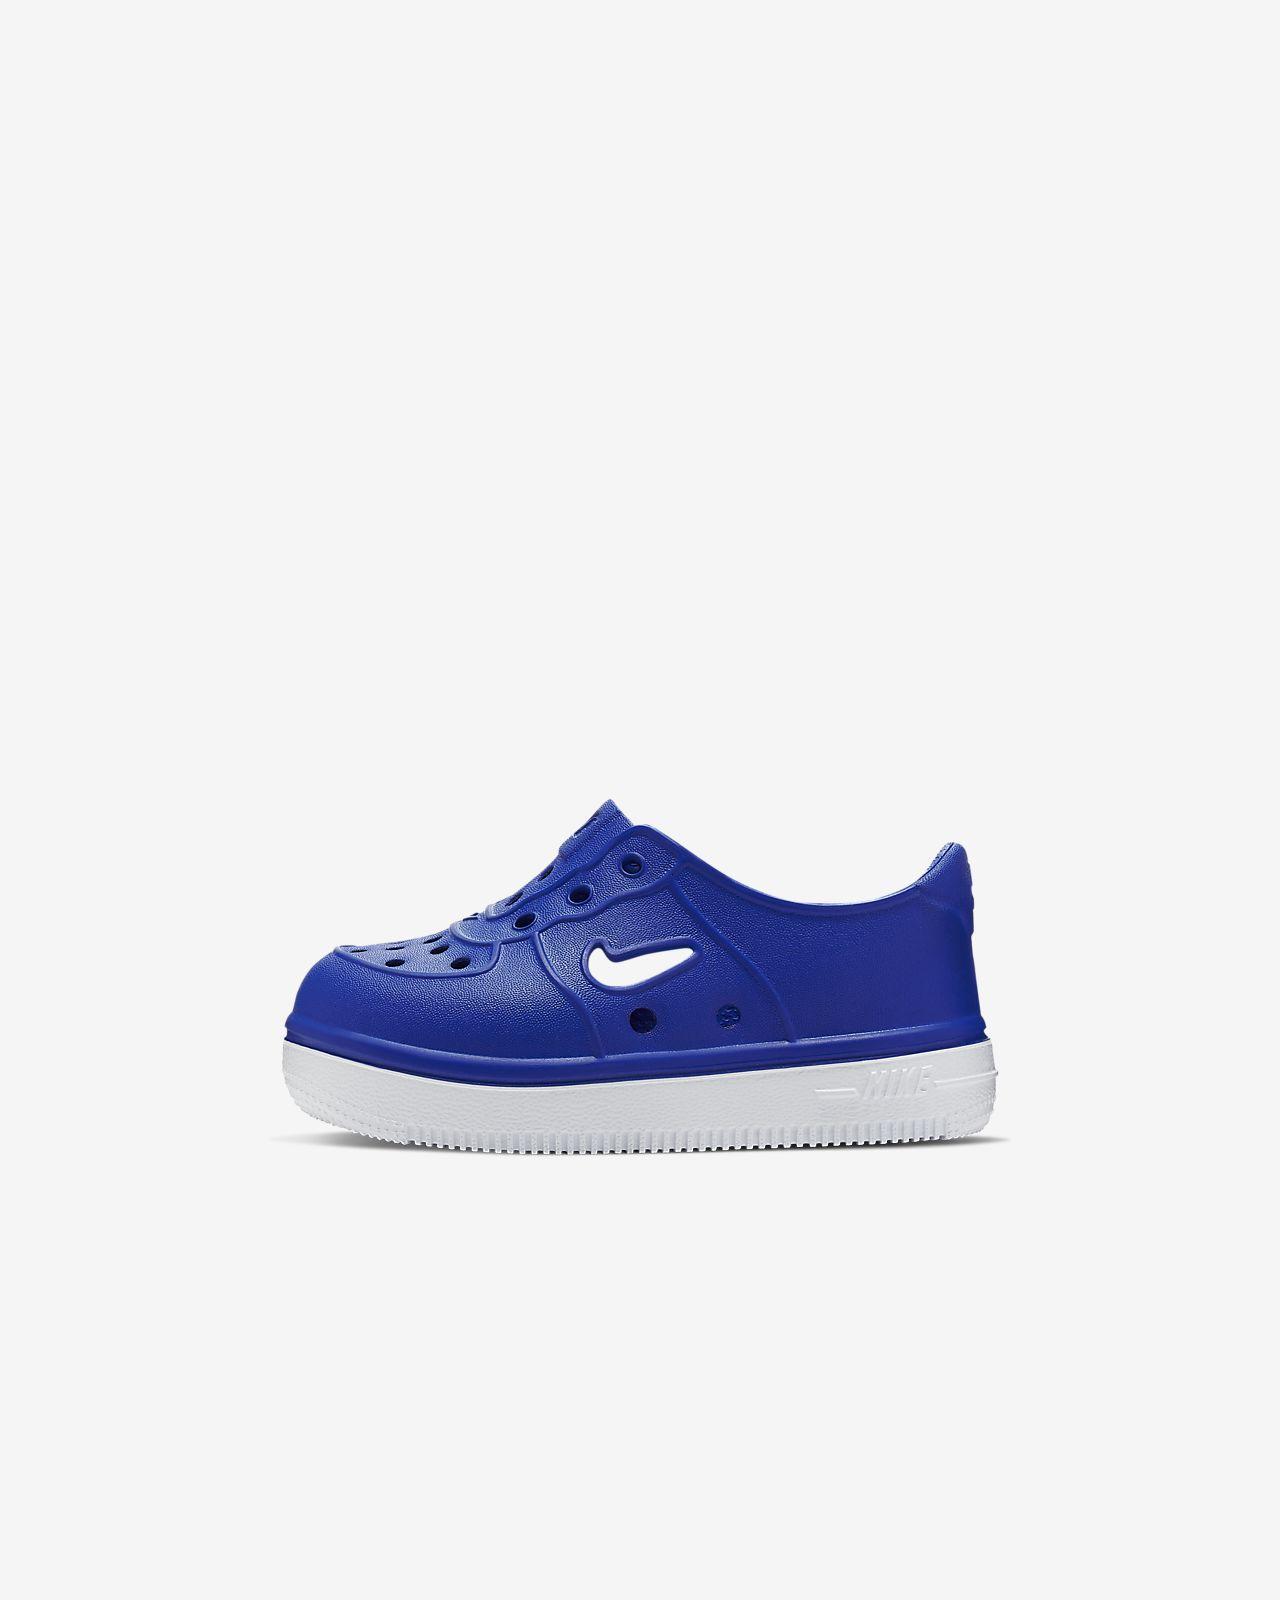 Nike Foam Force & Toddler Shoe